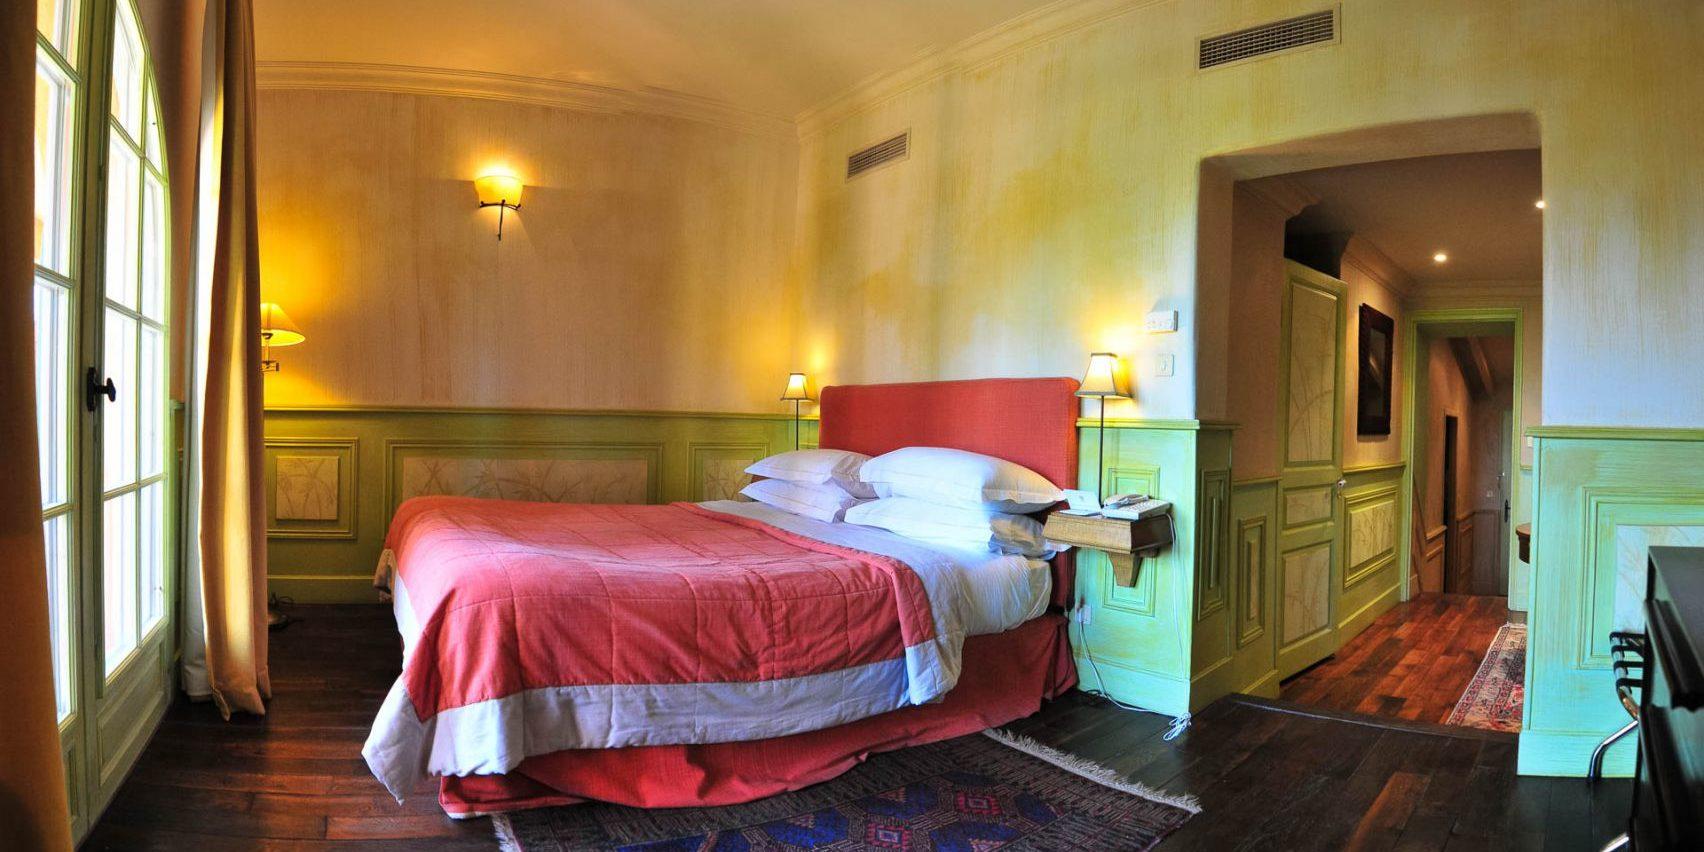 Hotel La Signoria Calvi Balagne Corsica Frankrijk kamer Demeure